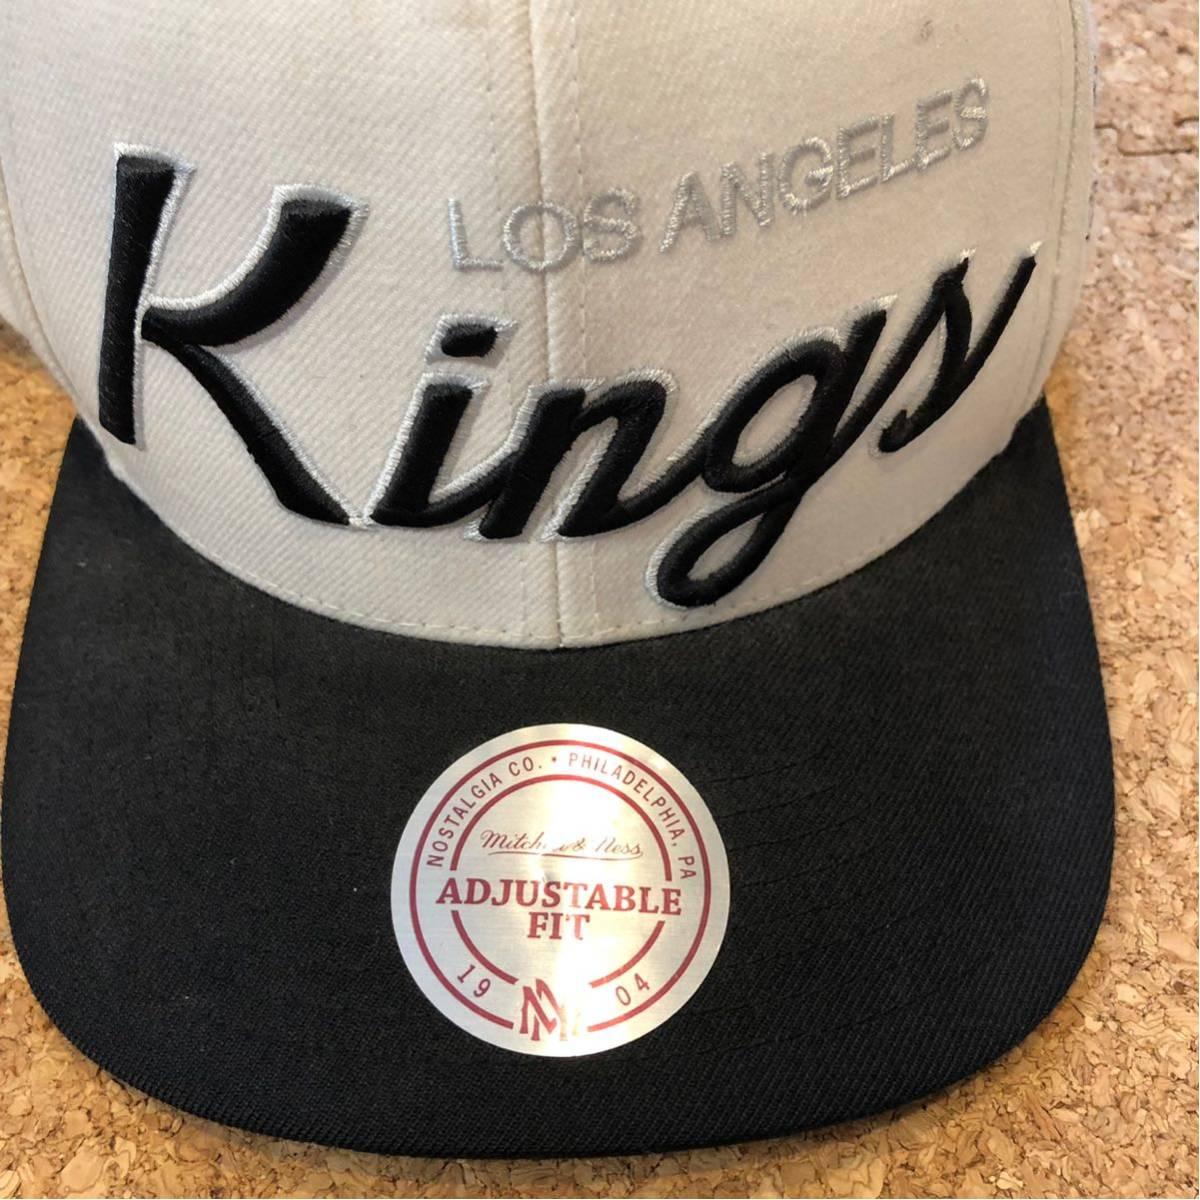 mitchell≠ss NHL losangeles kings キャップ スナップバック 白黒_画像2